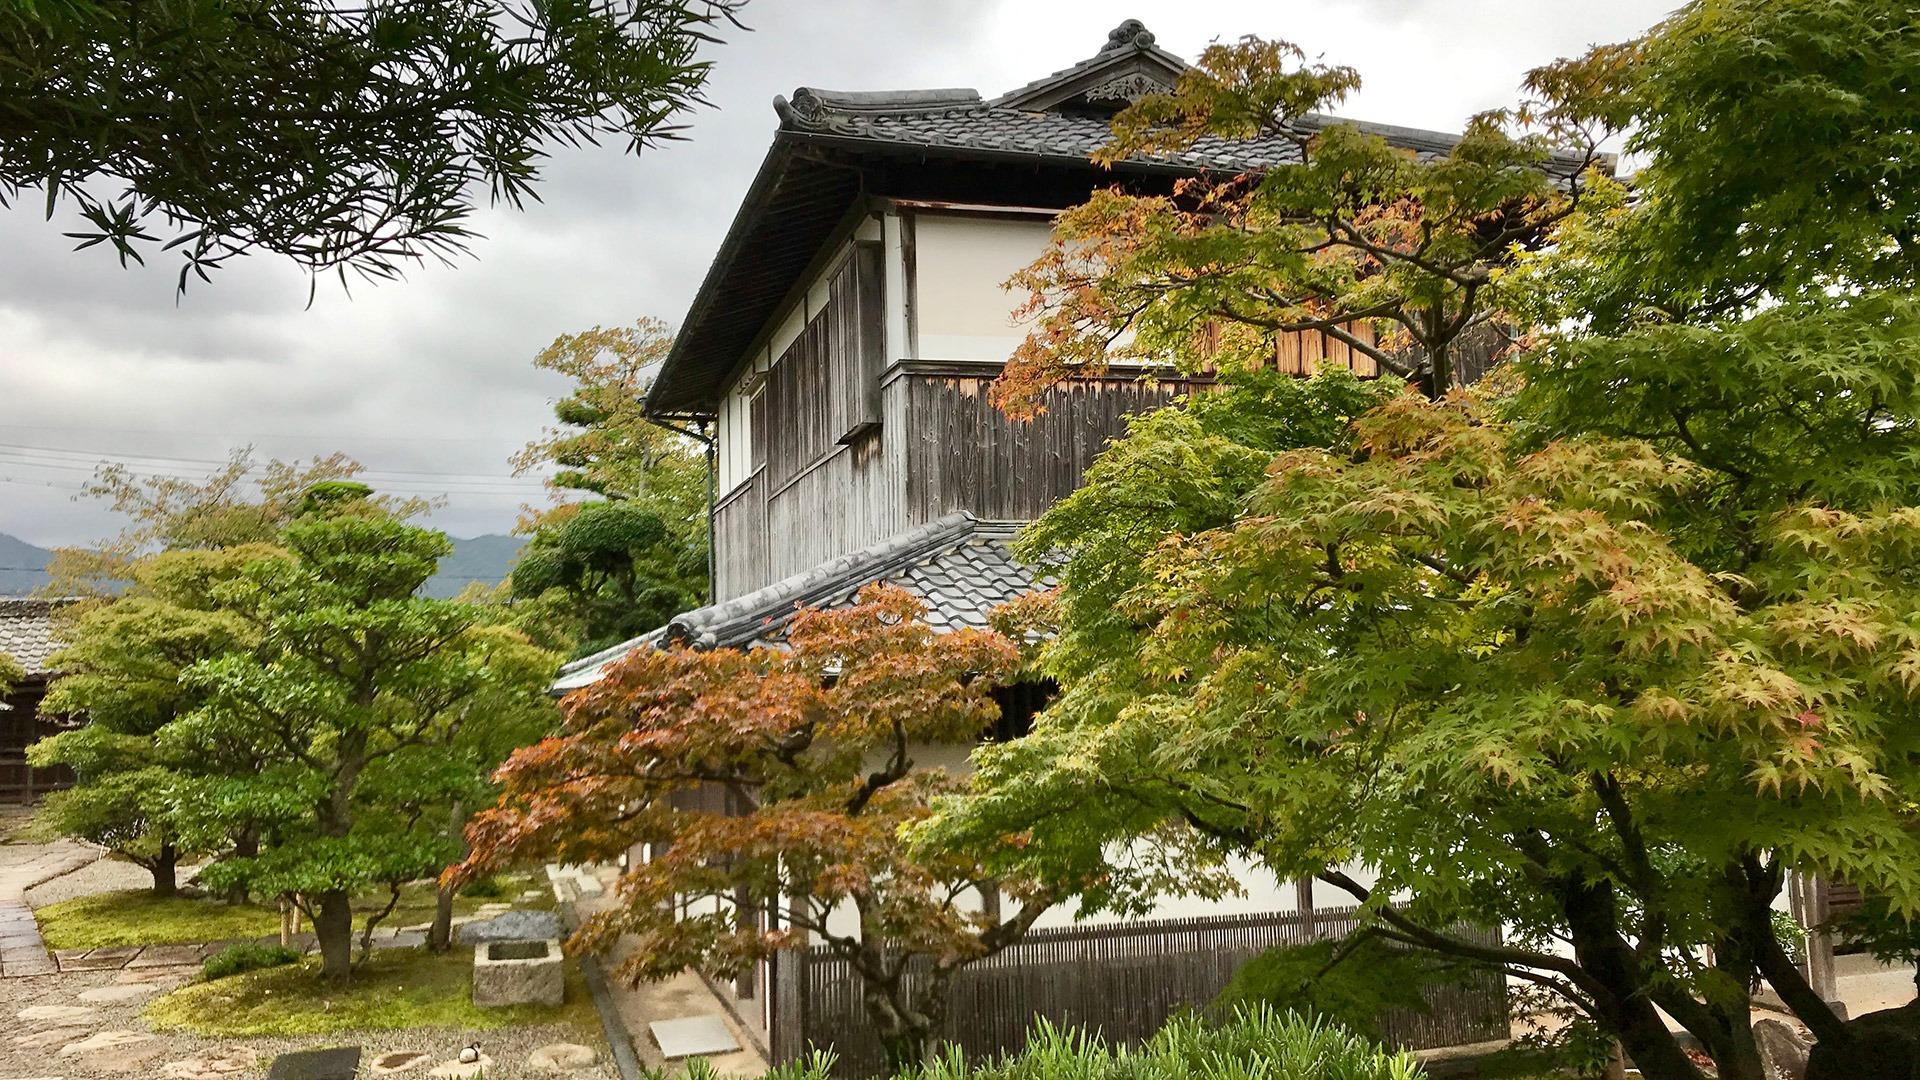 Traditional architecture of the Kikuya Residence in Hagi, Japan